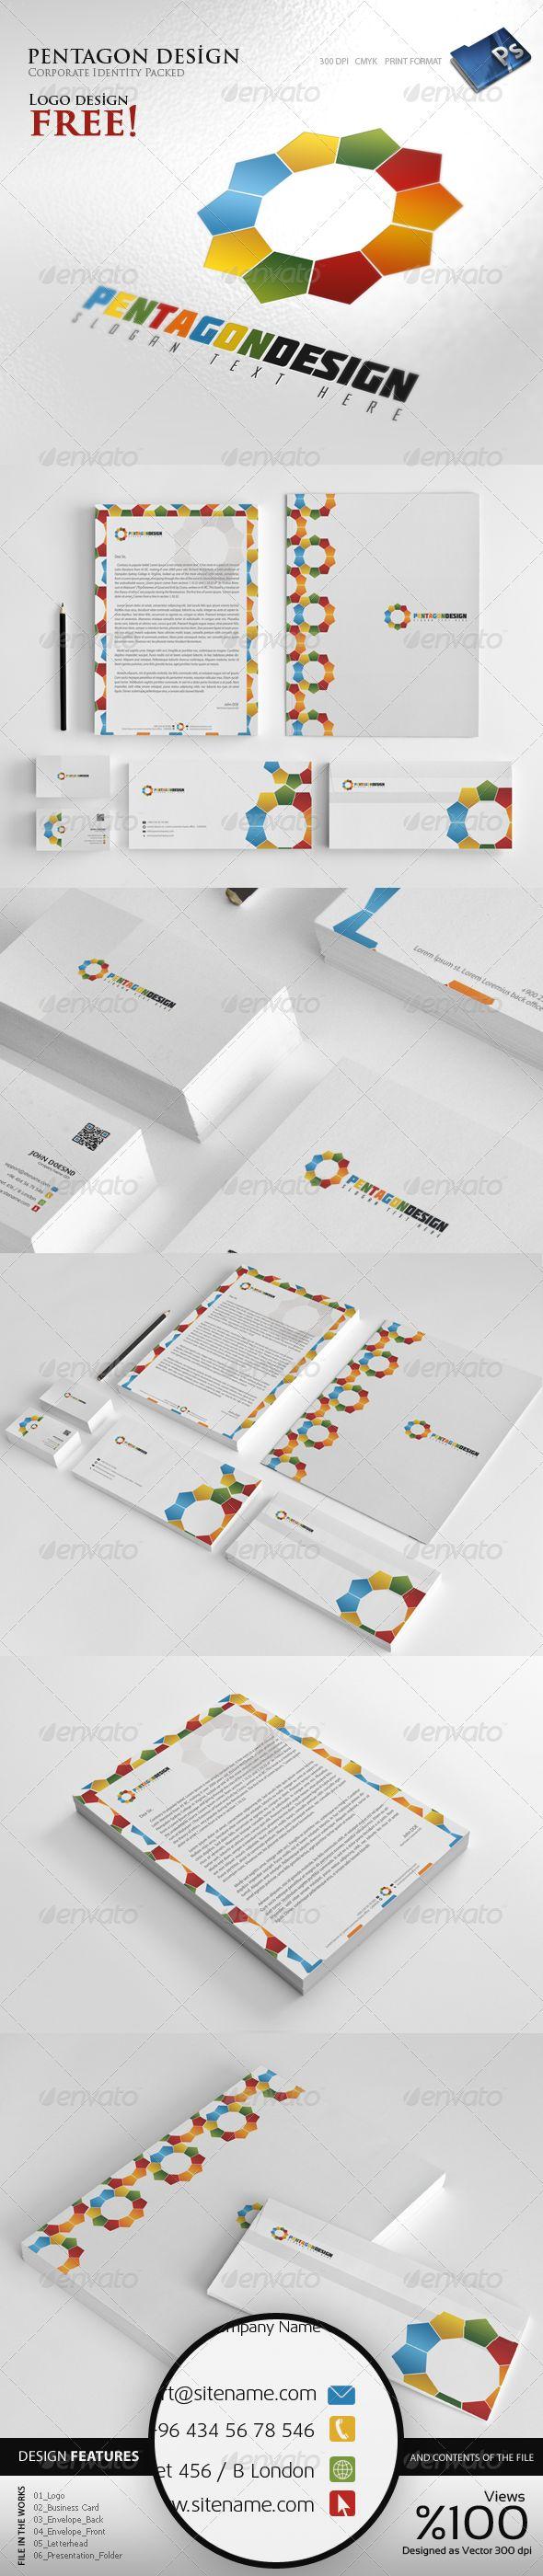 #Pentagon #Design - #Corporate #identity - #Stationery #Print #Templates Downloa...